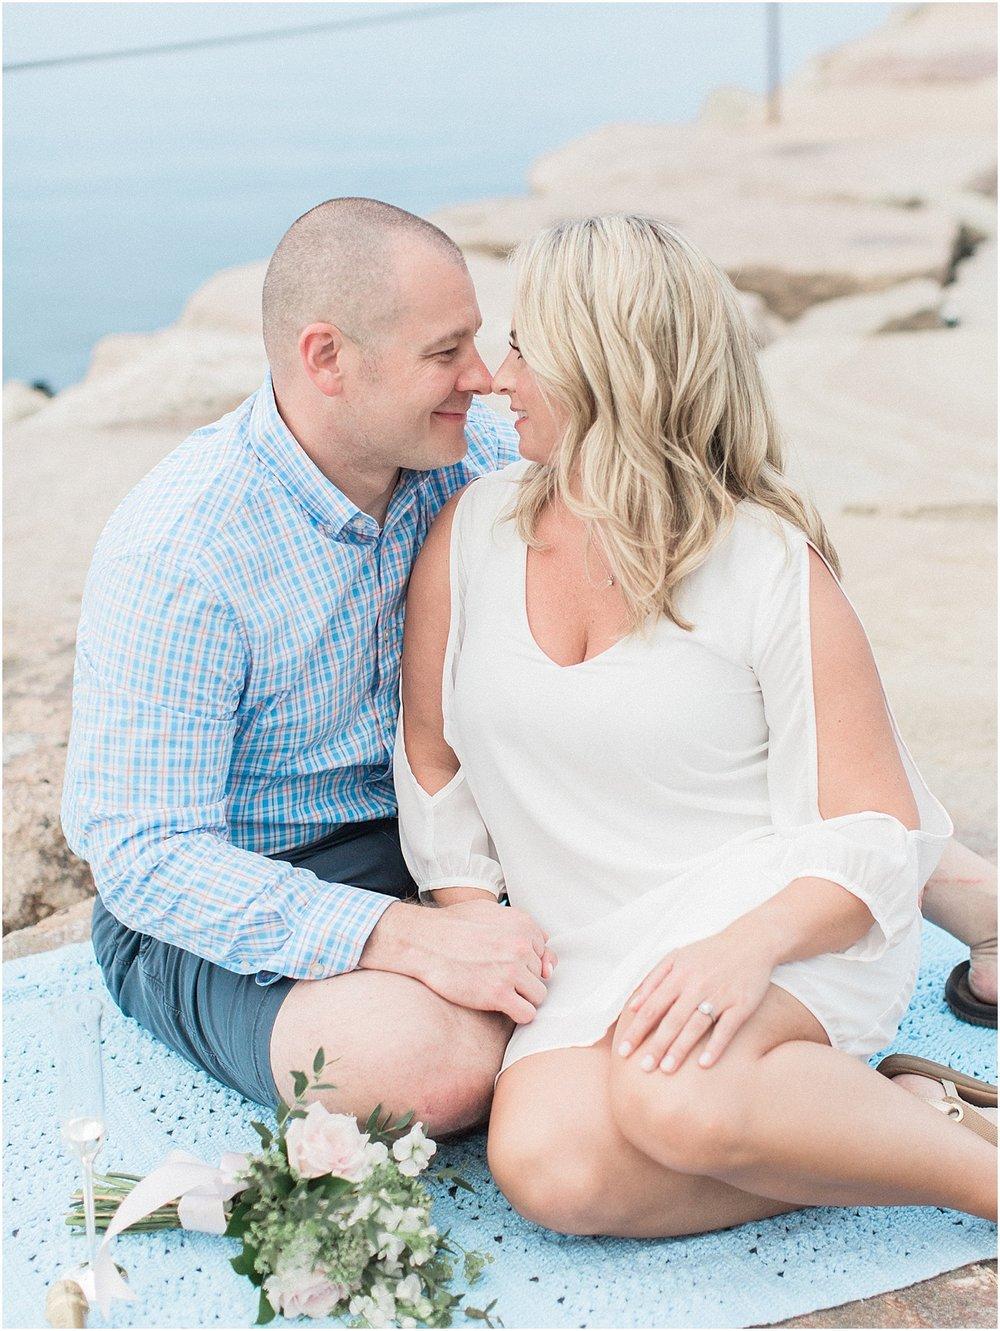 amy_erik_plymouth_brewster_gardens_jetty_champagne_cape_cod_boston_wedding_photographer_meredith_jane_photography_photo_0772.jpg